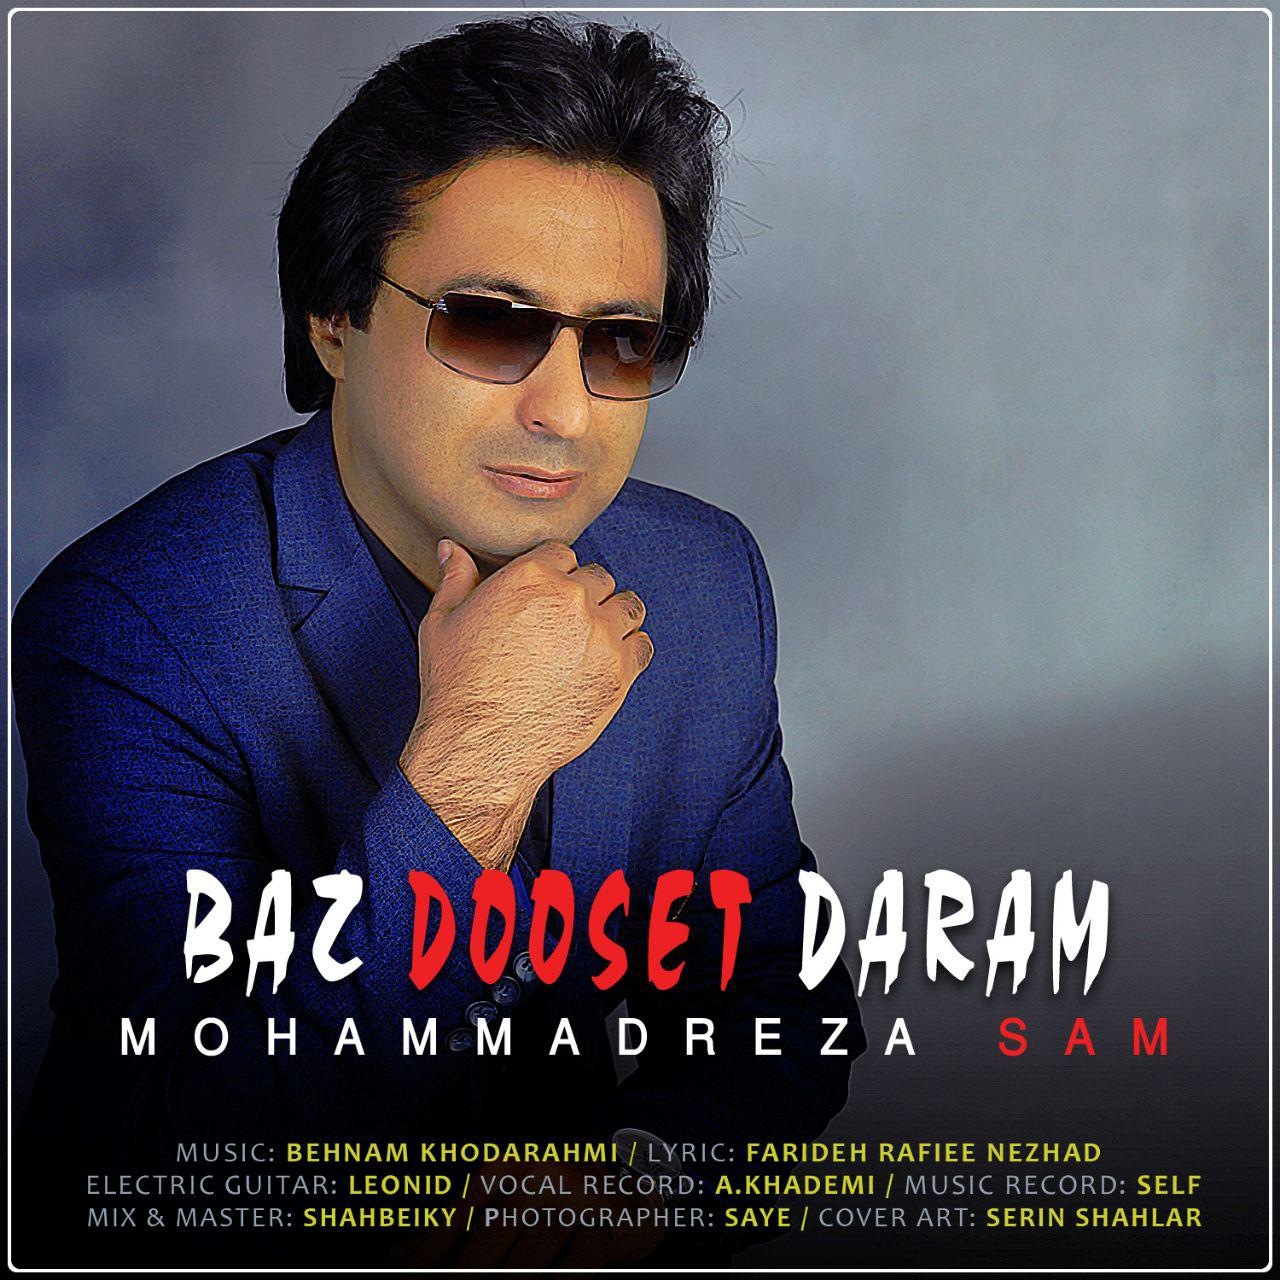 Mohammadreza Sam – Baz Dooset Daram